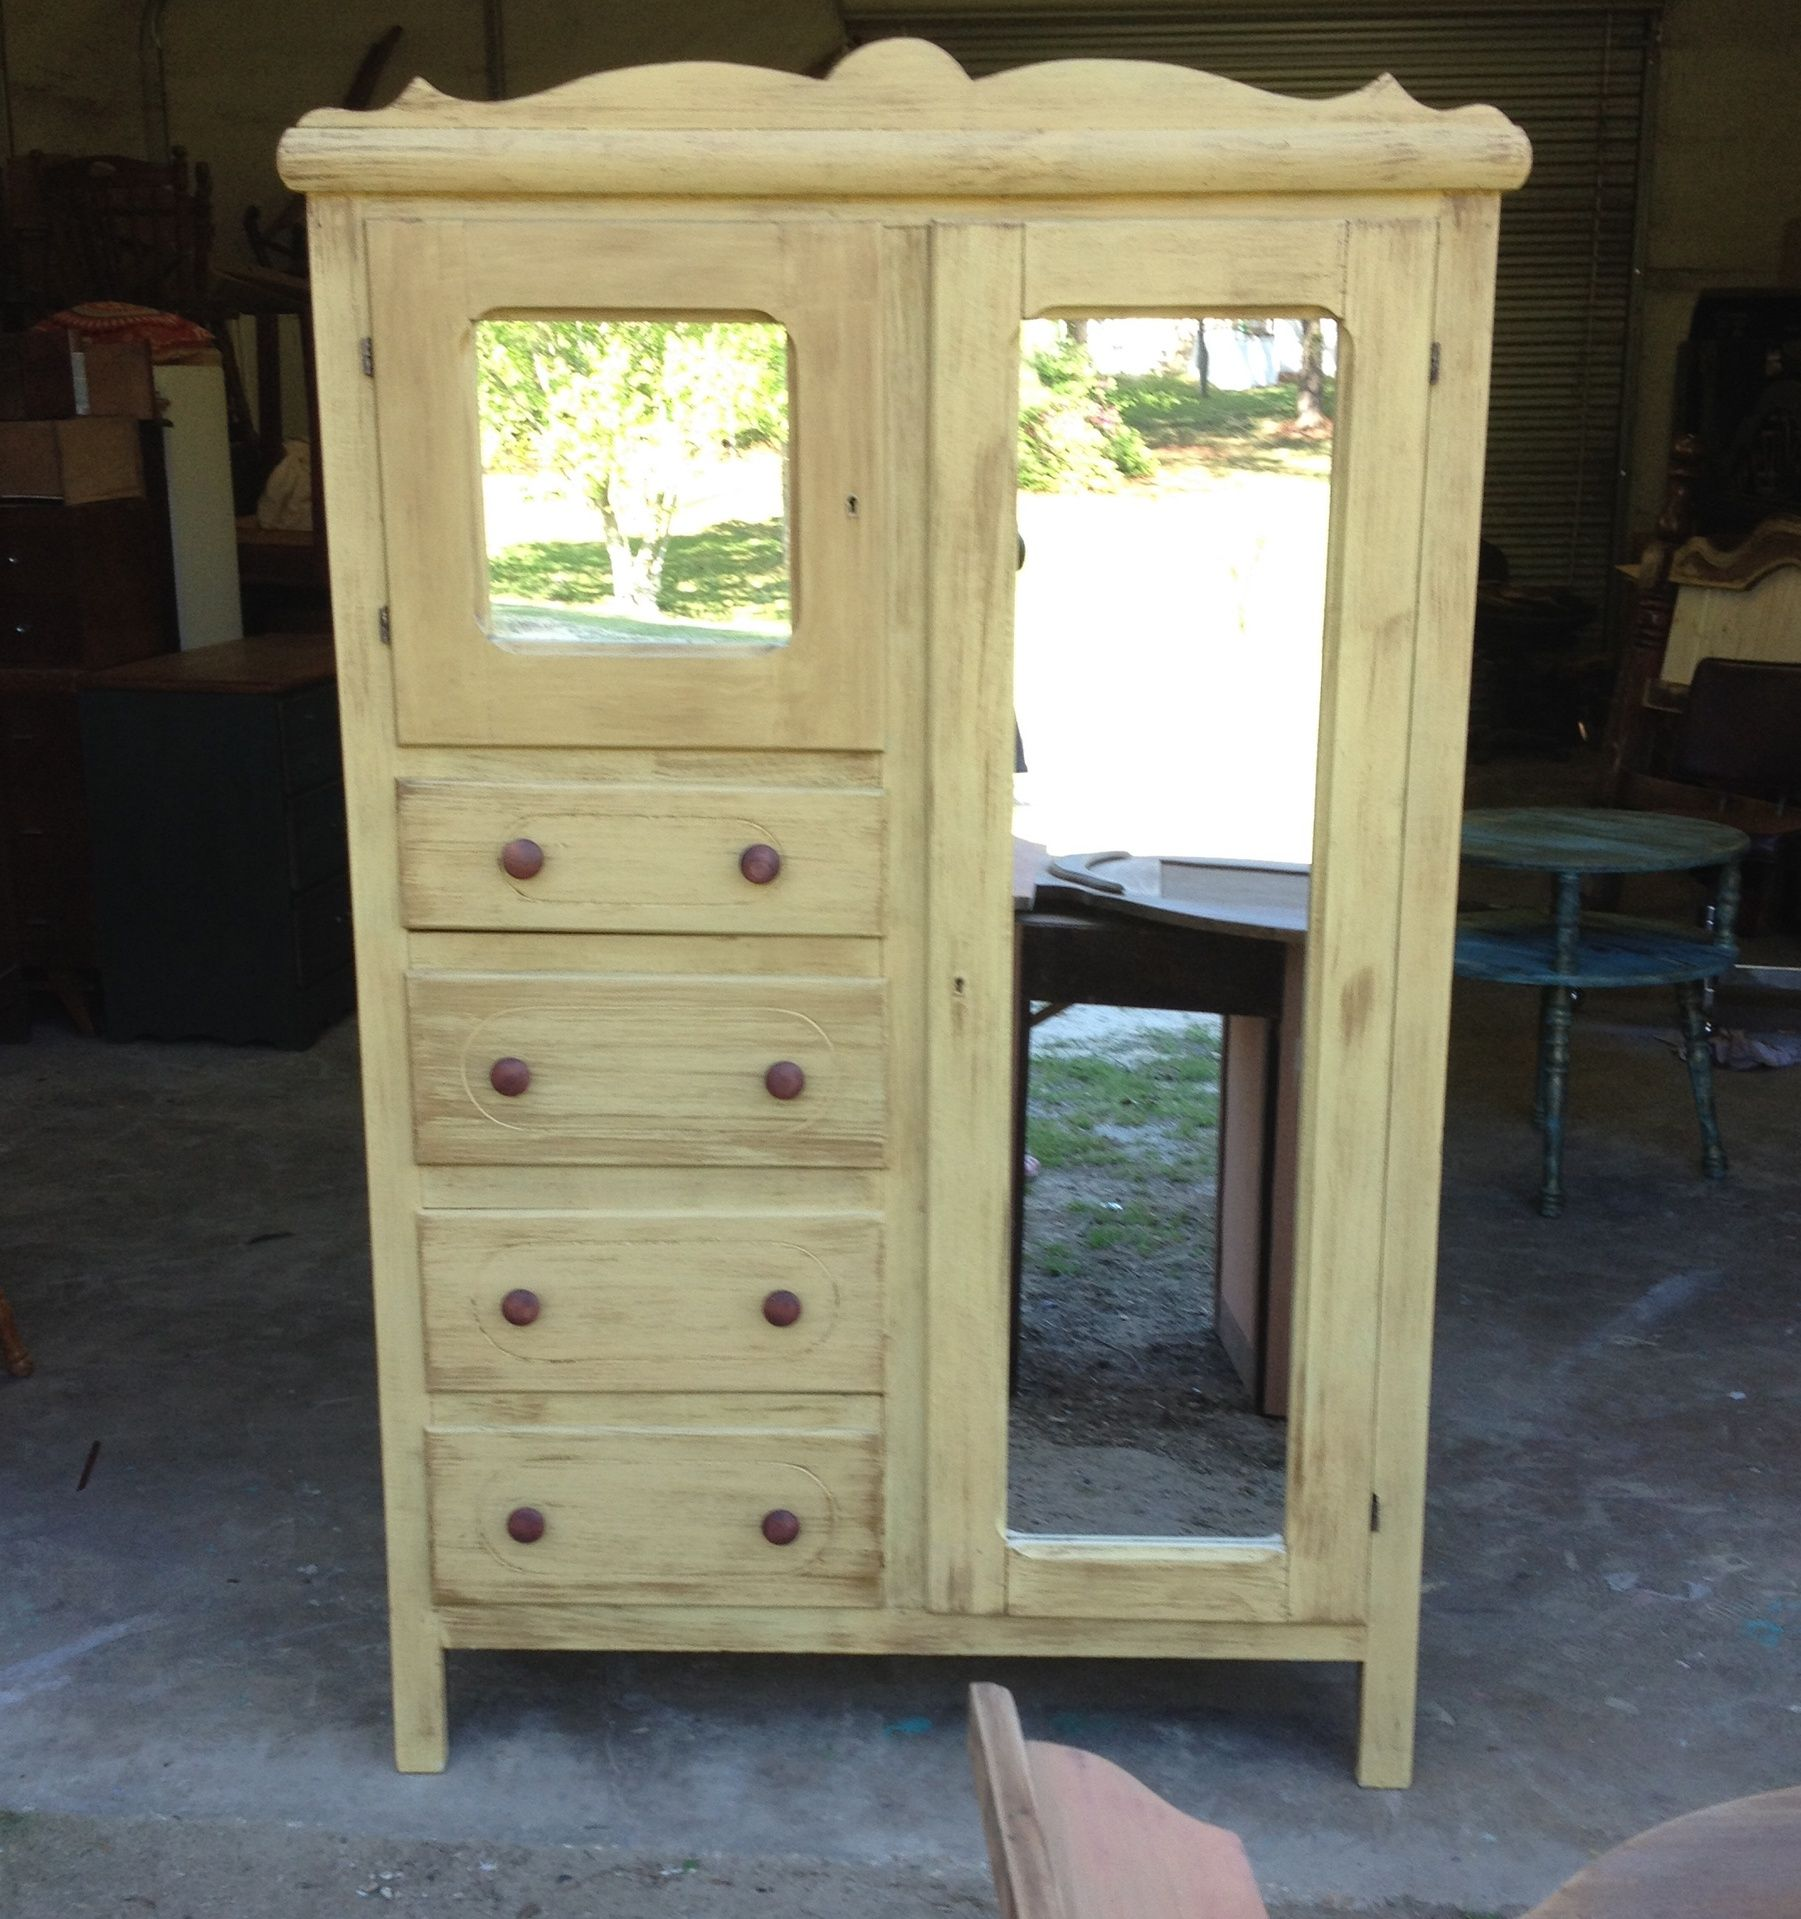 HONEY DO THIS - Gallery Antique armoire restored | Antique ...